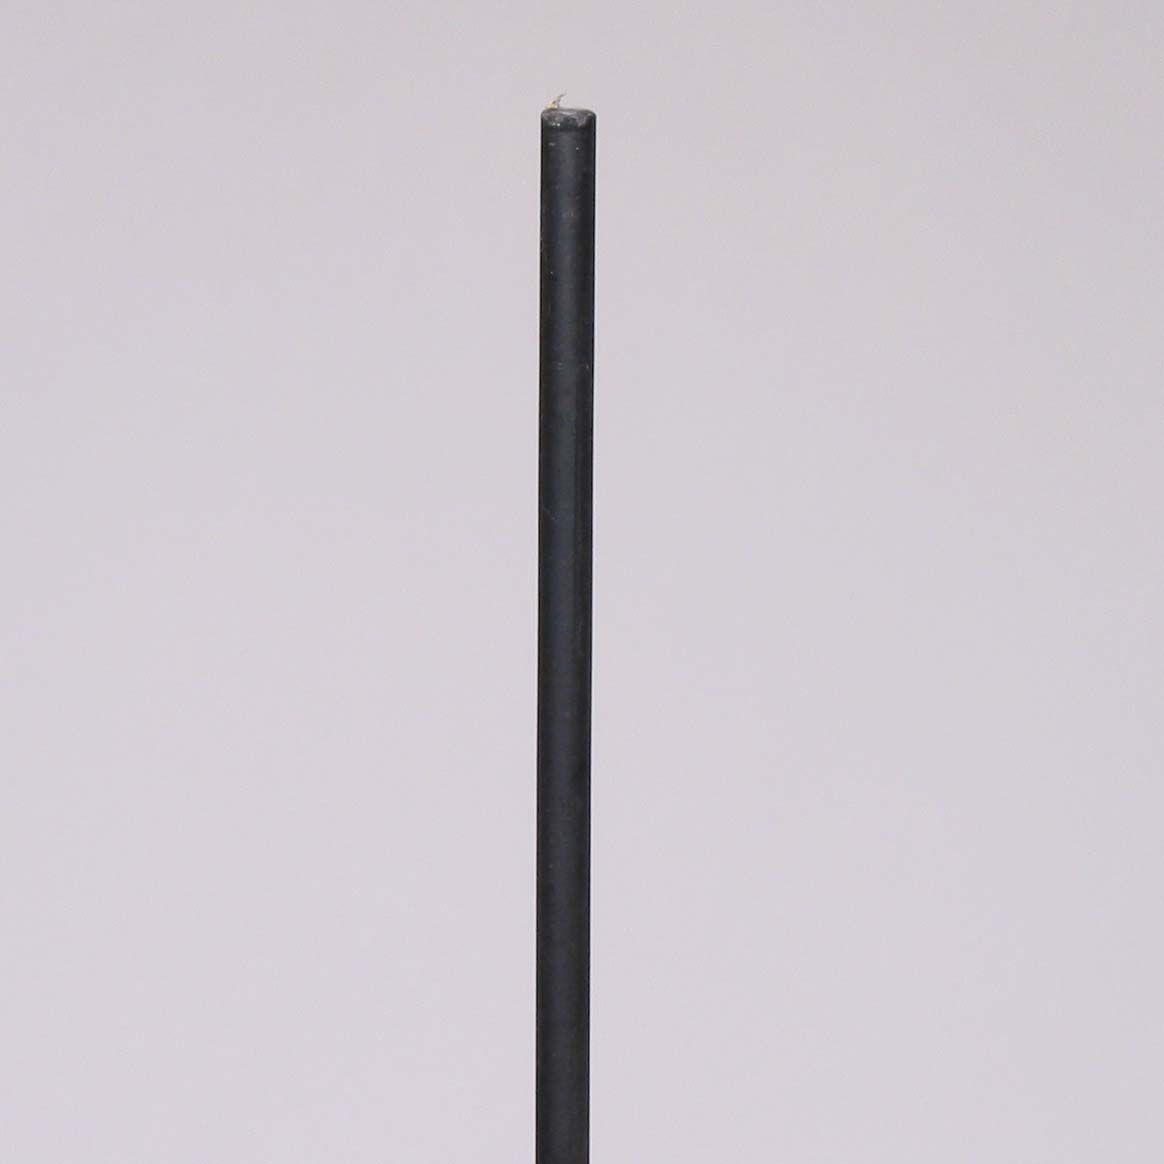 Metallstab- 140 cmvon Zauberblume